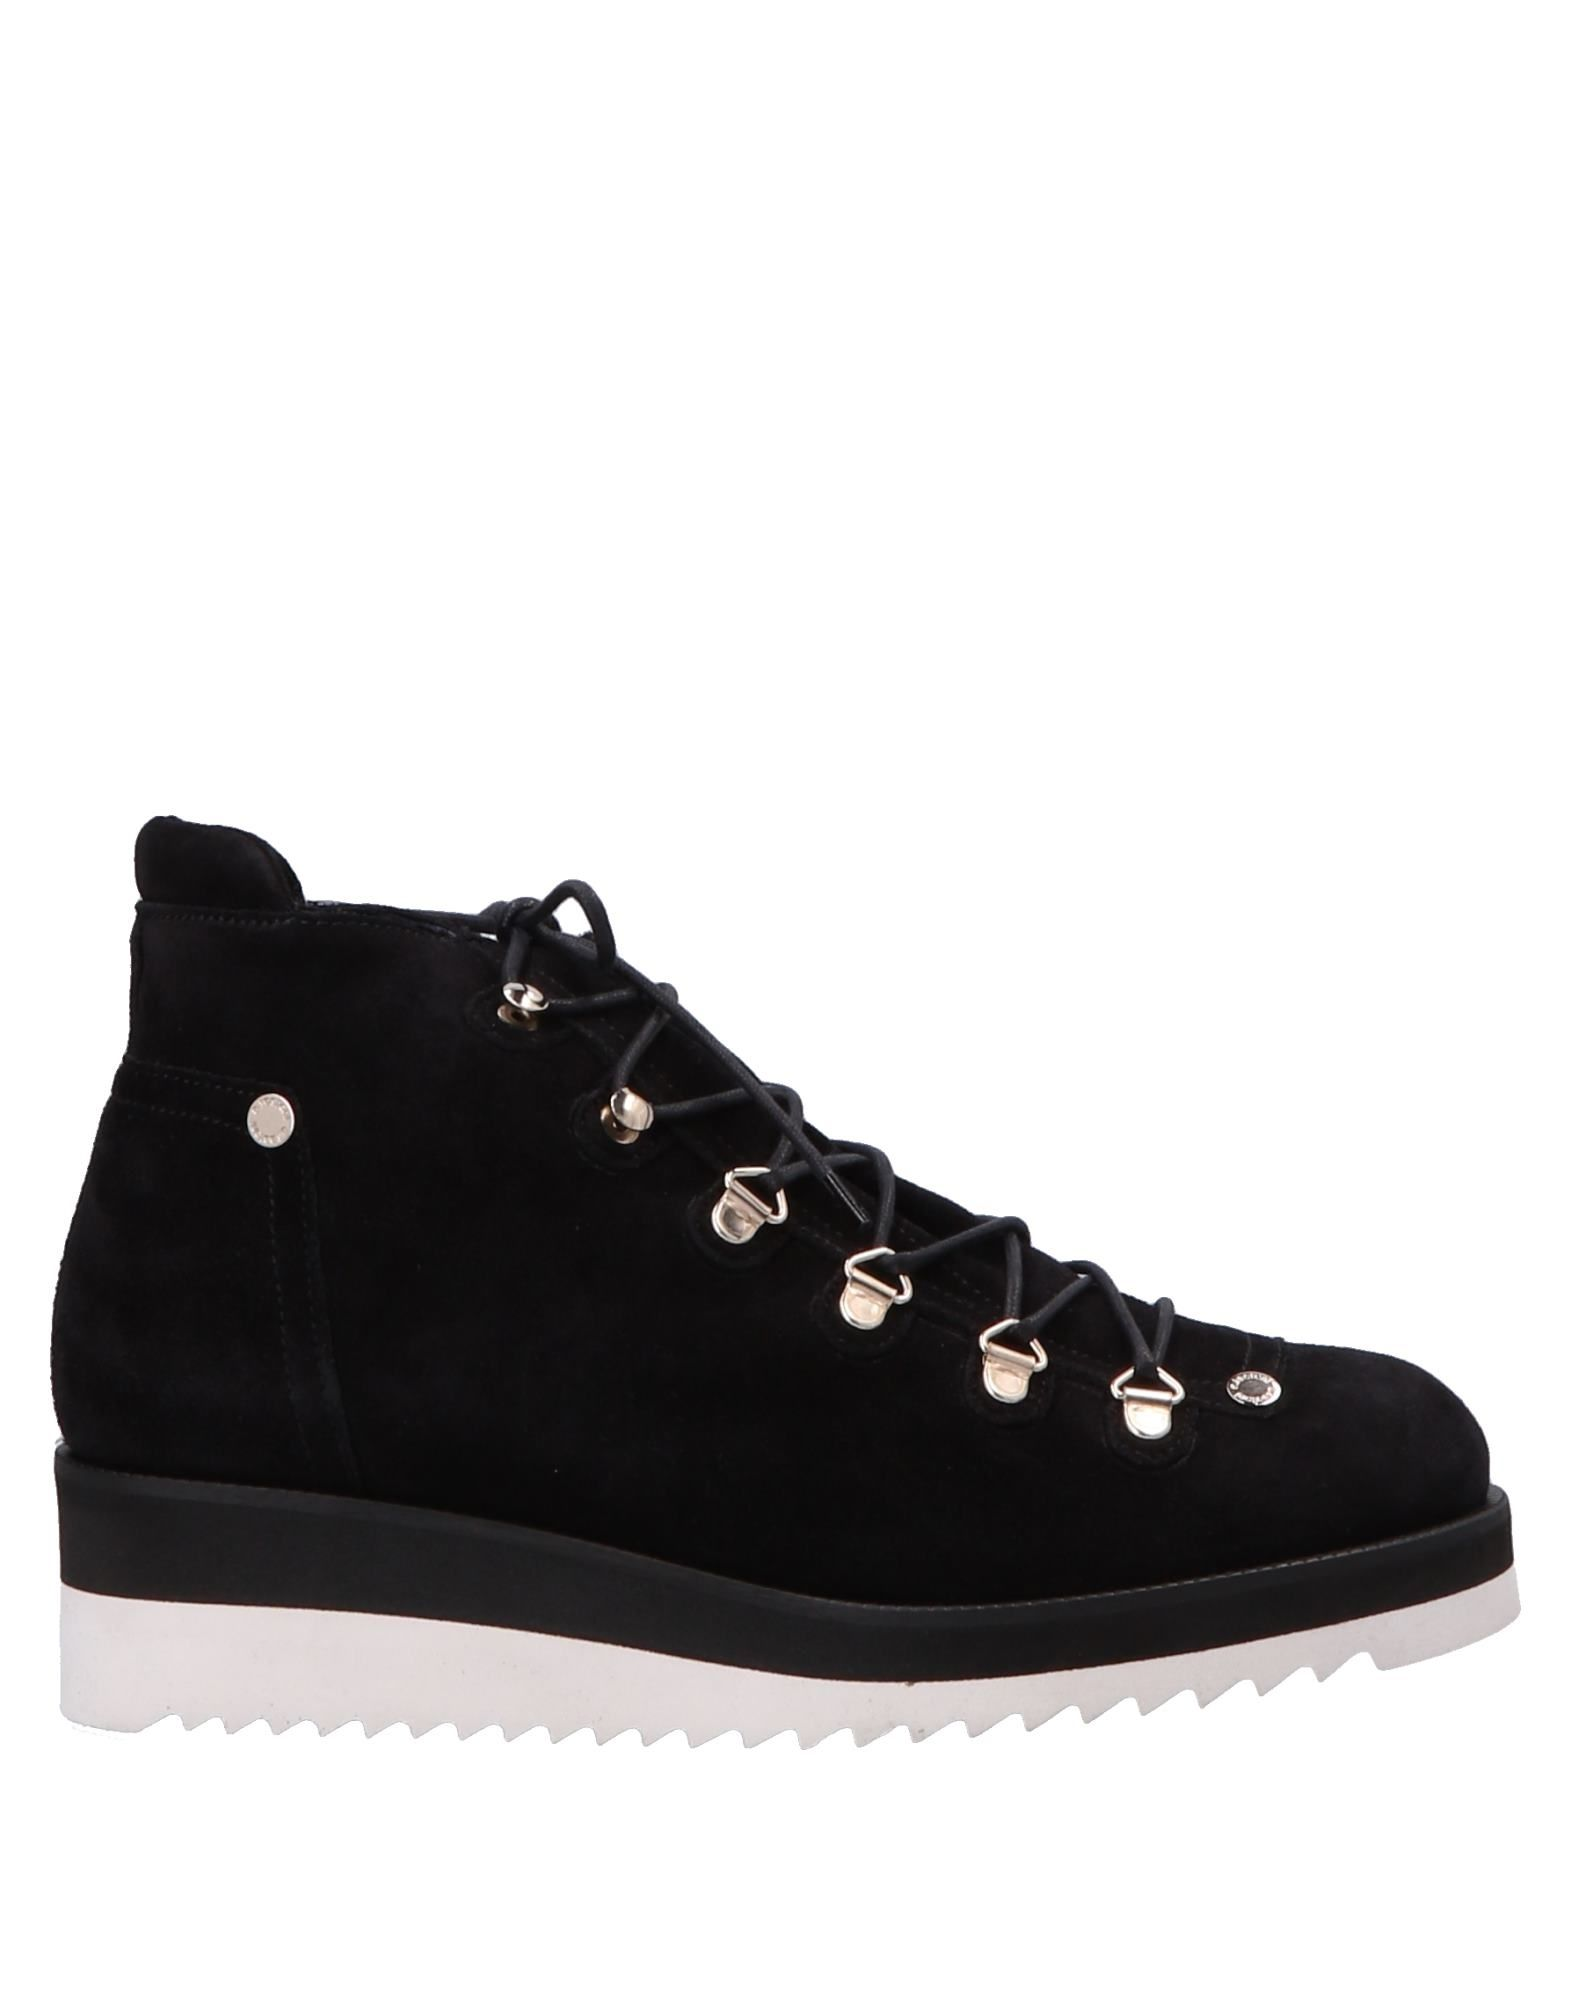 A.Testoni Ankle Boot - Women Ankle A.Testoni Ankle Women Boots online on  Australia - 11546952QN a0ac7d